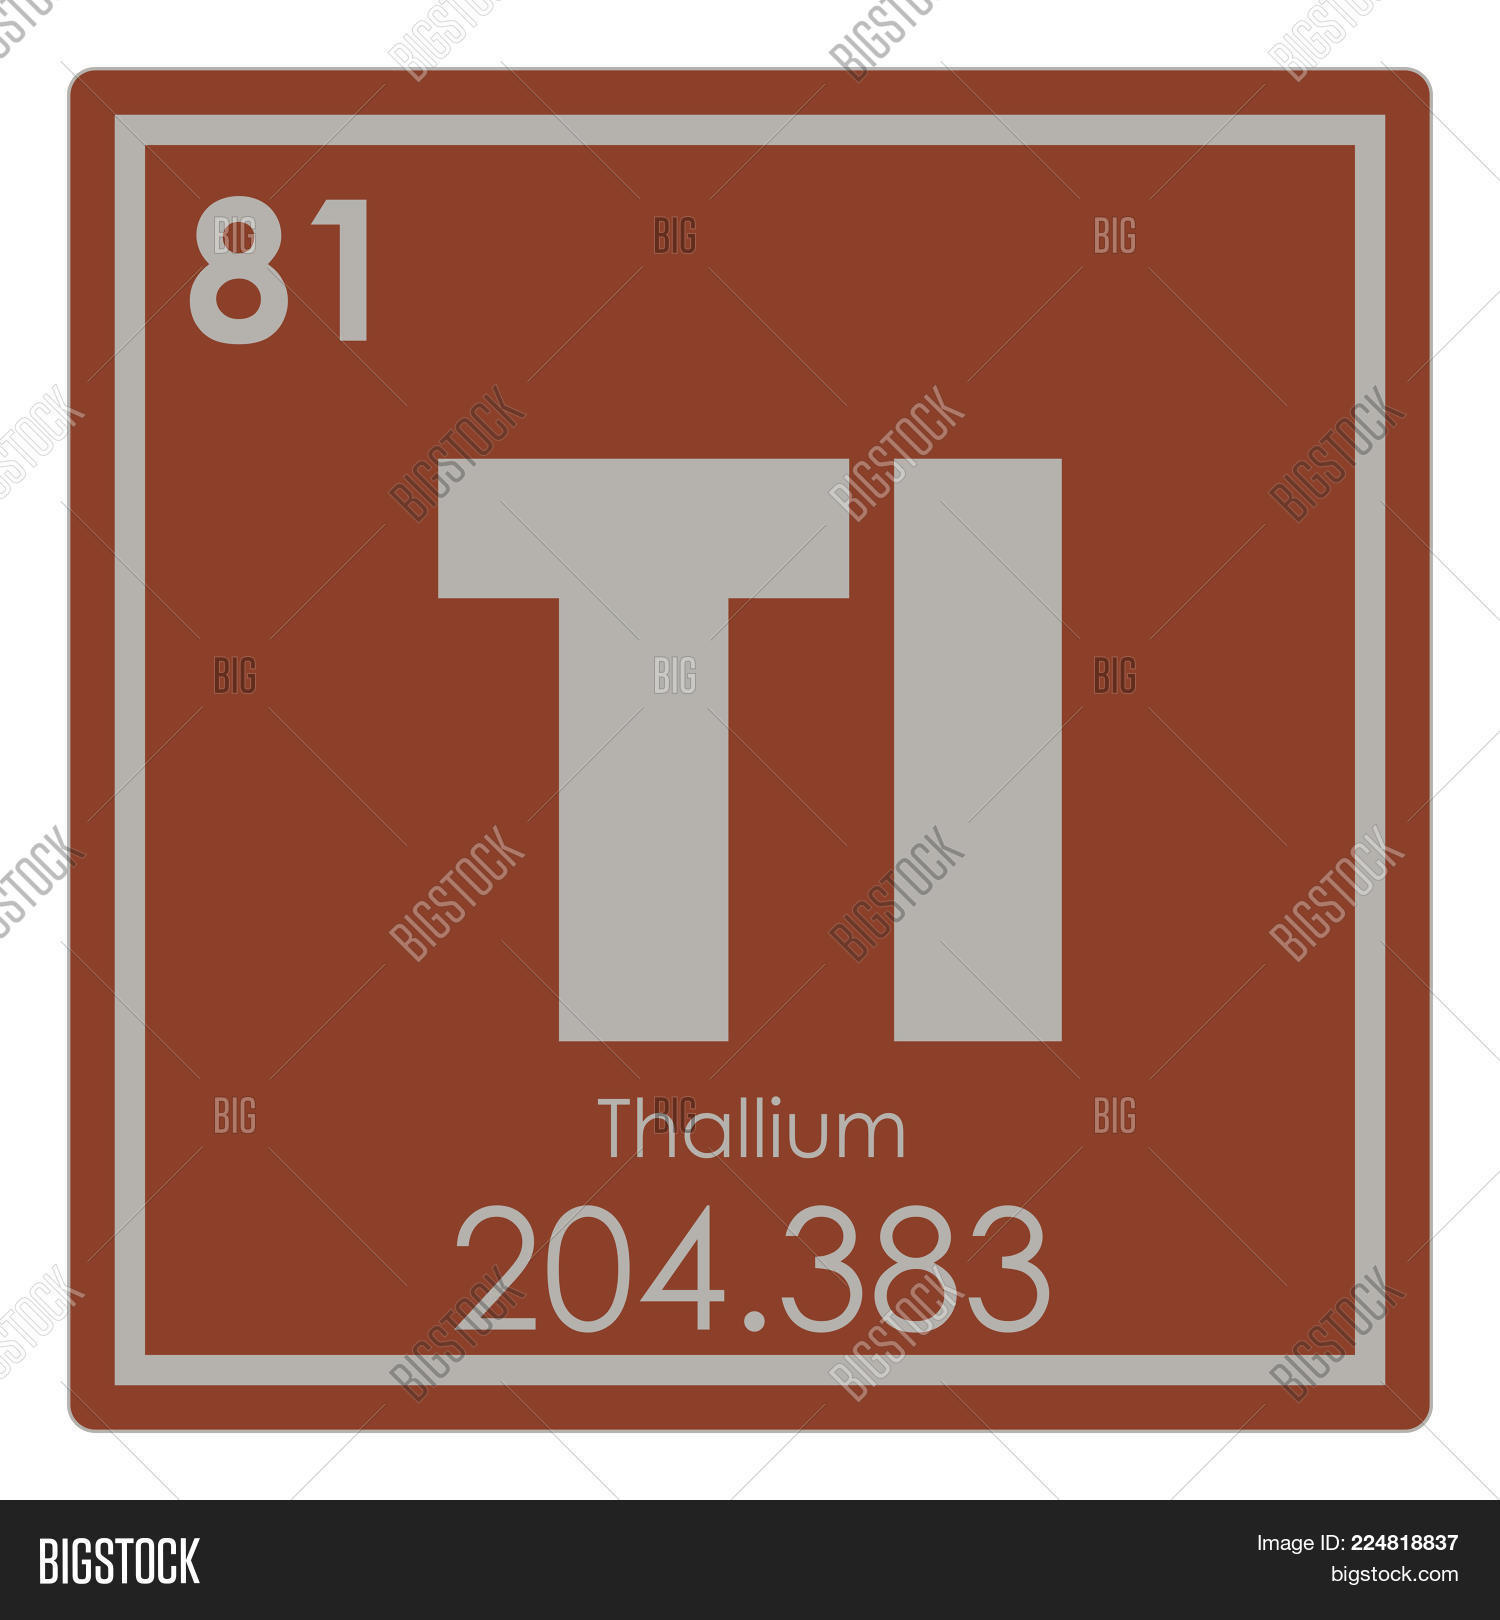 Thallium Chemical Image Photo Free Trial Bigstock